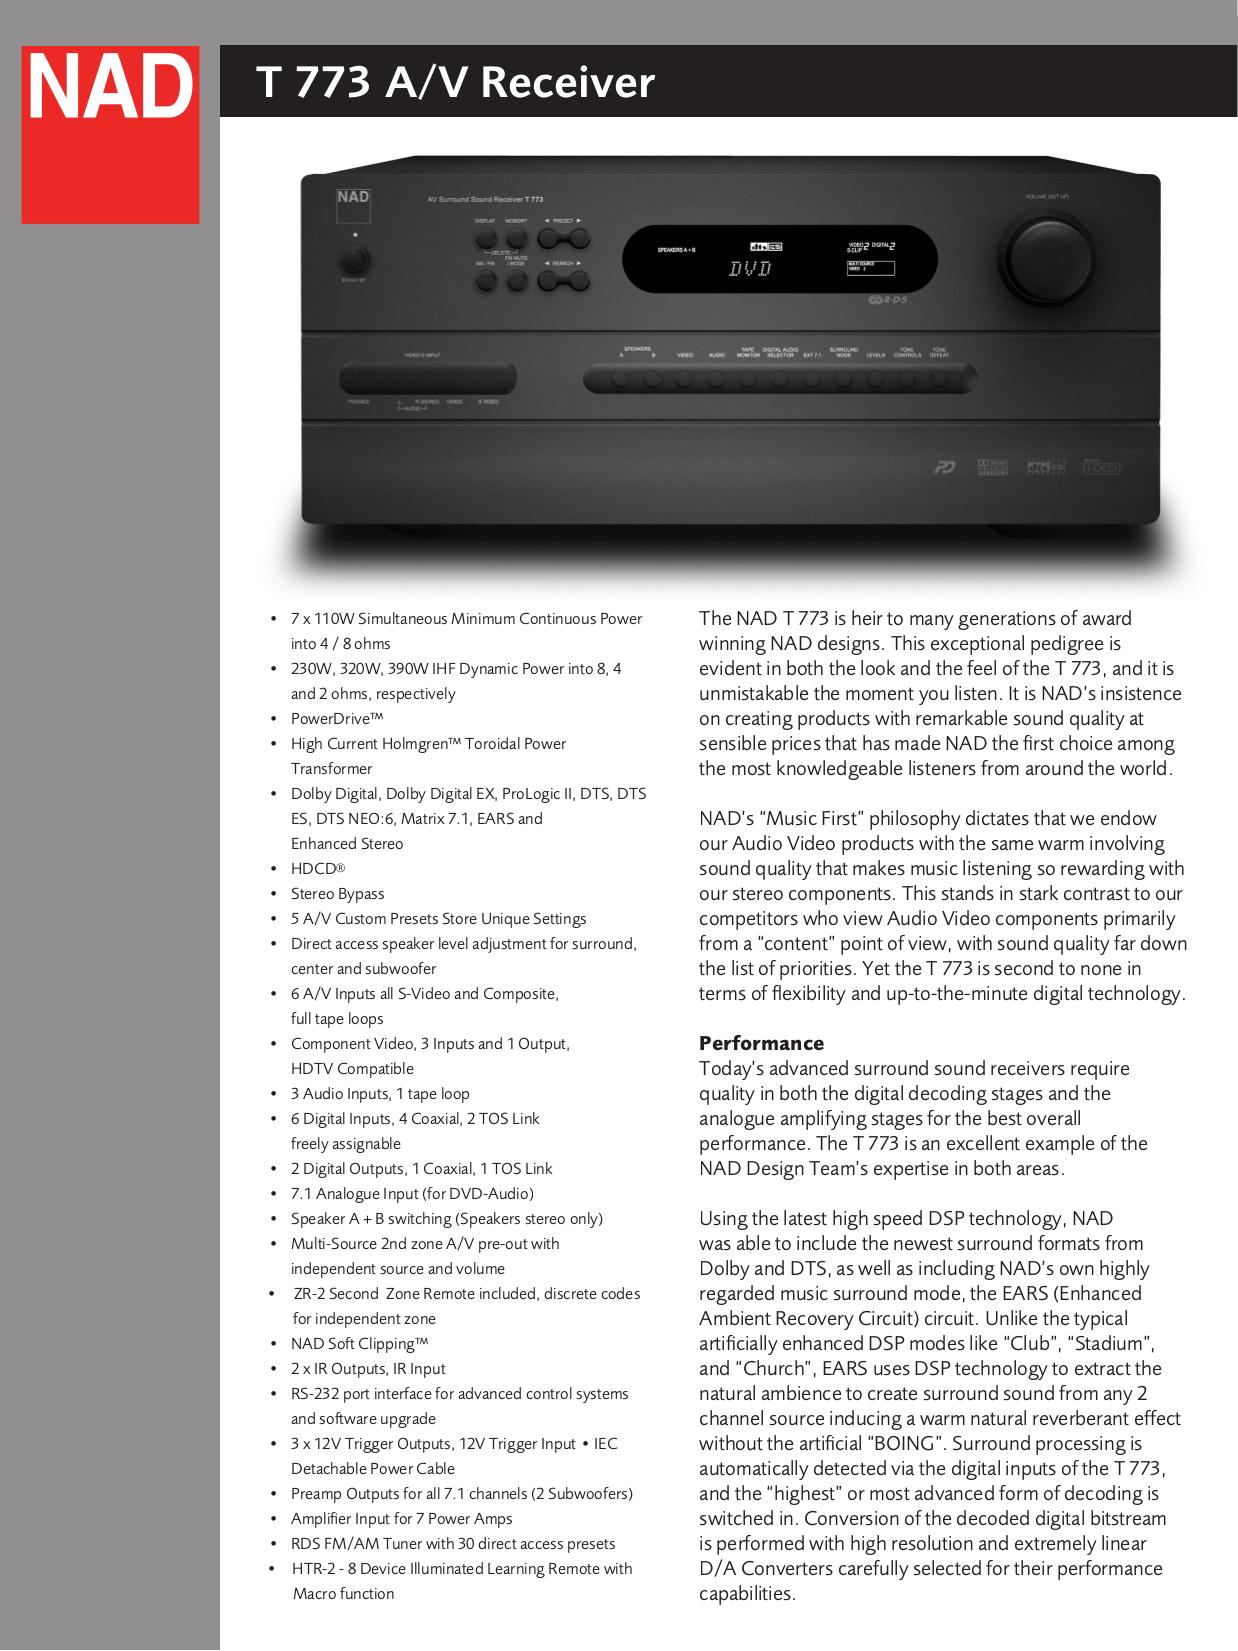 download free pdf for nad t773 receiver manual rh umlib com nad t 773 service manual pdf nad t 773 service manual